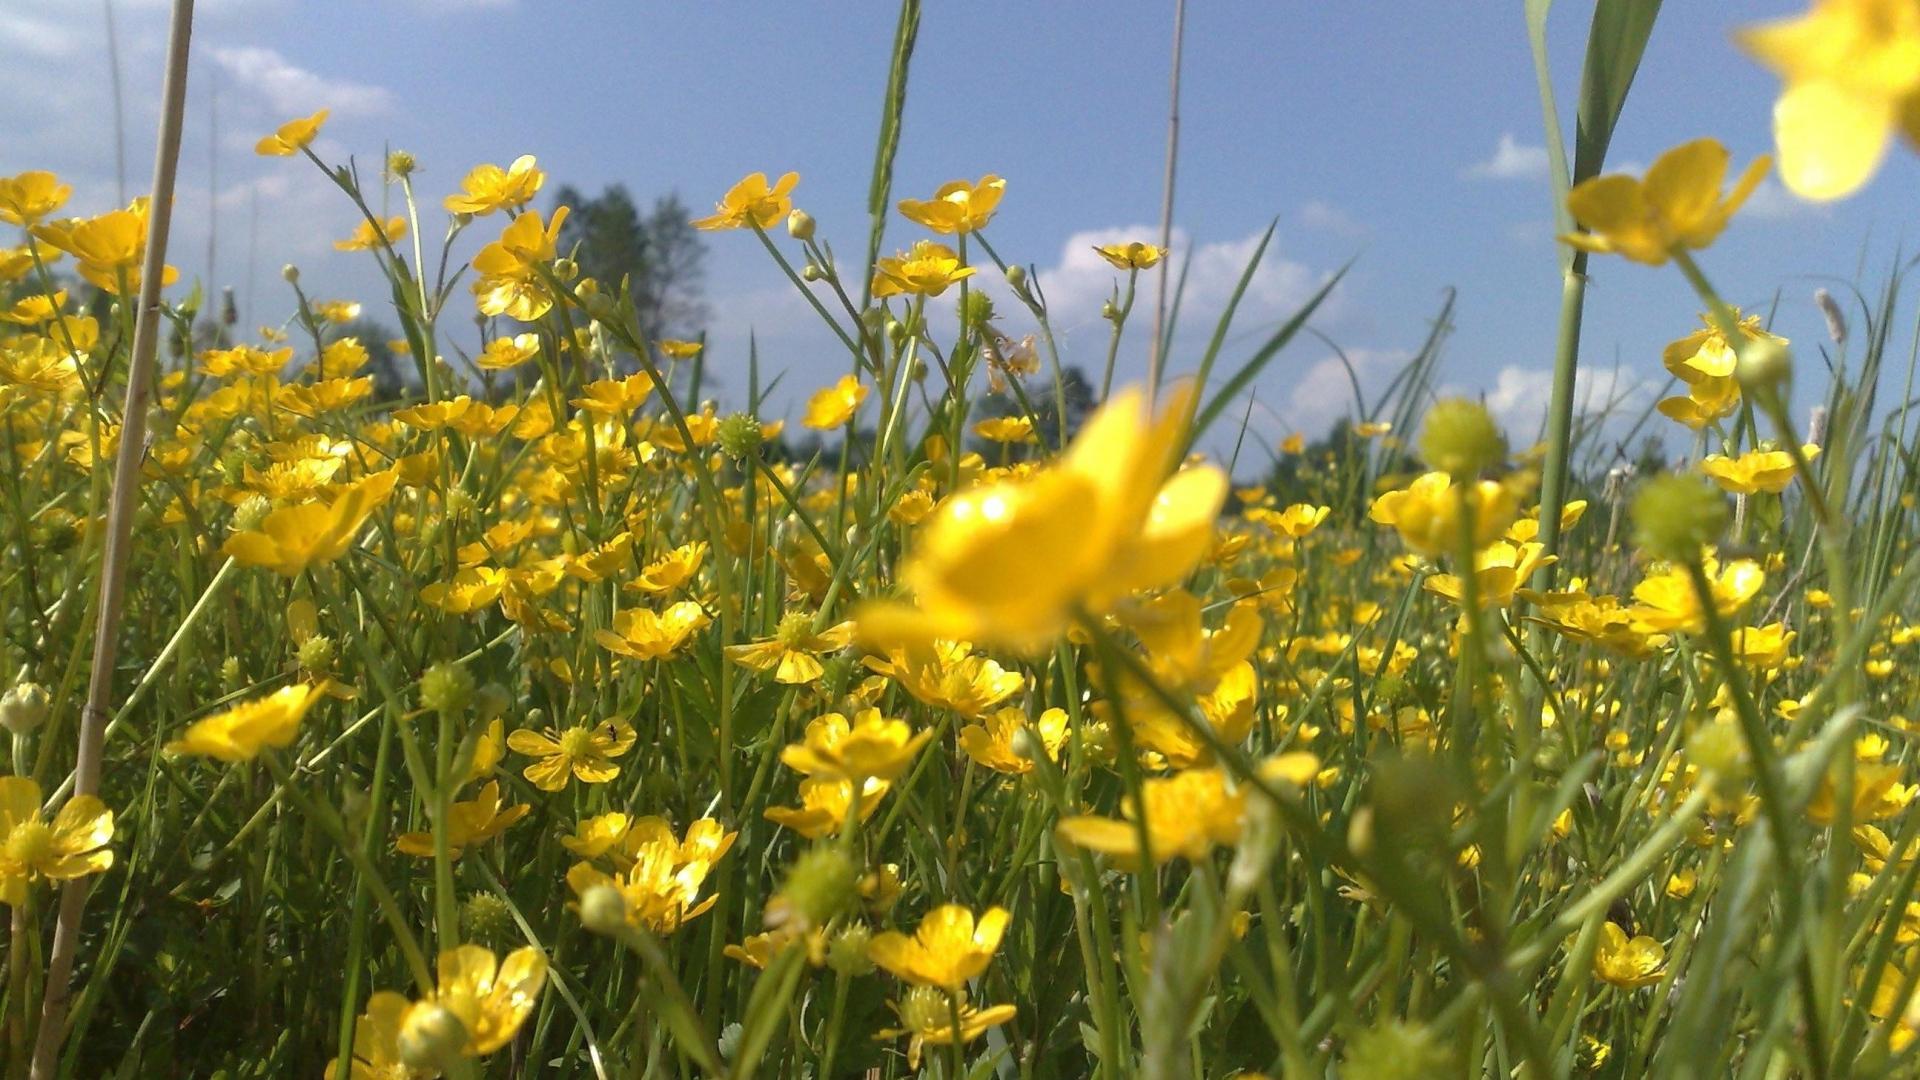 Wallpaper 1920x1080 flowers yellow field summer holiday mood 1920x1080